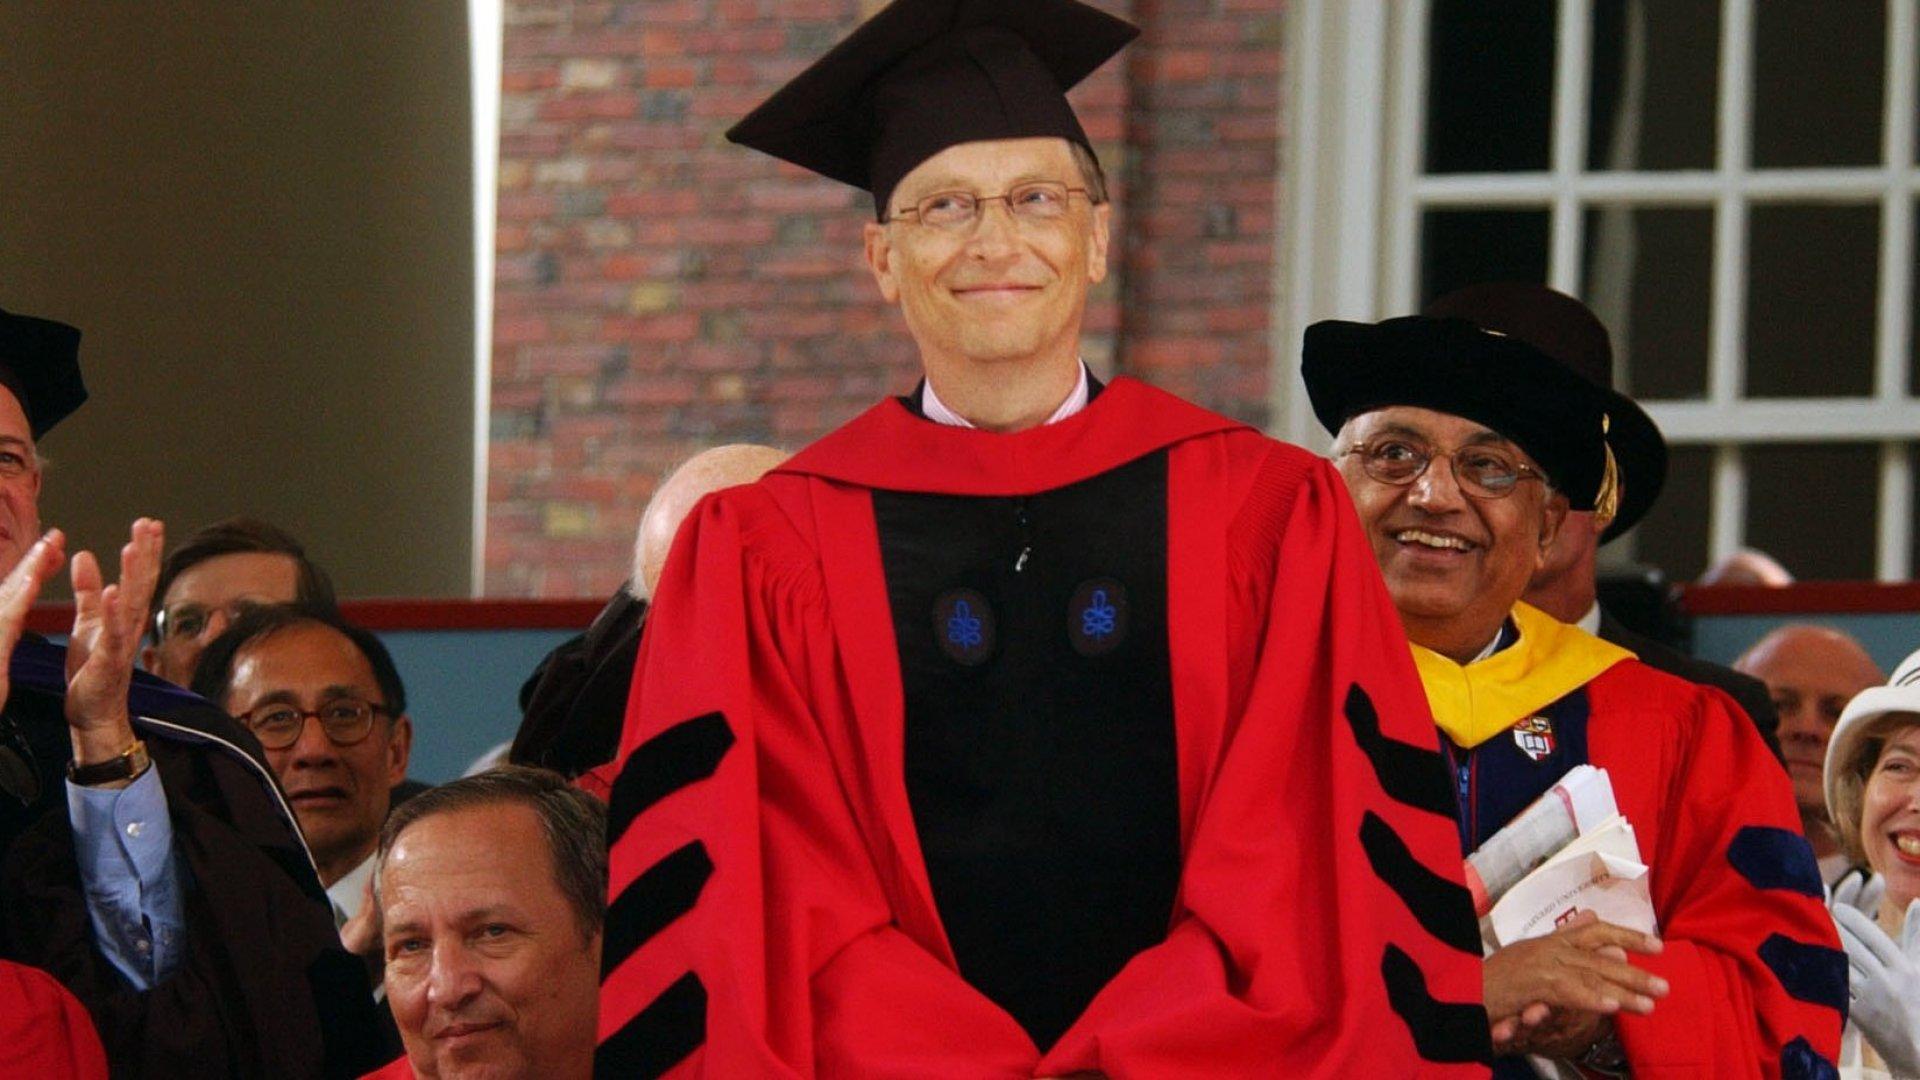 Applying to an MBA Program Like Wharton or Harvard? Here's How to Write Your Essay